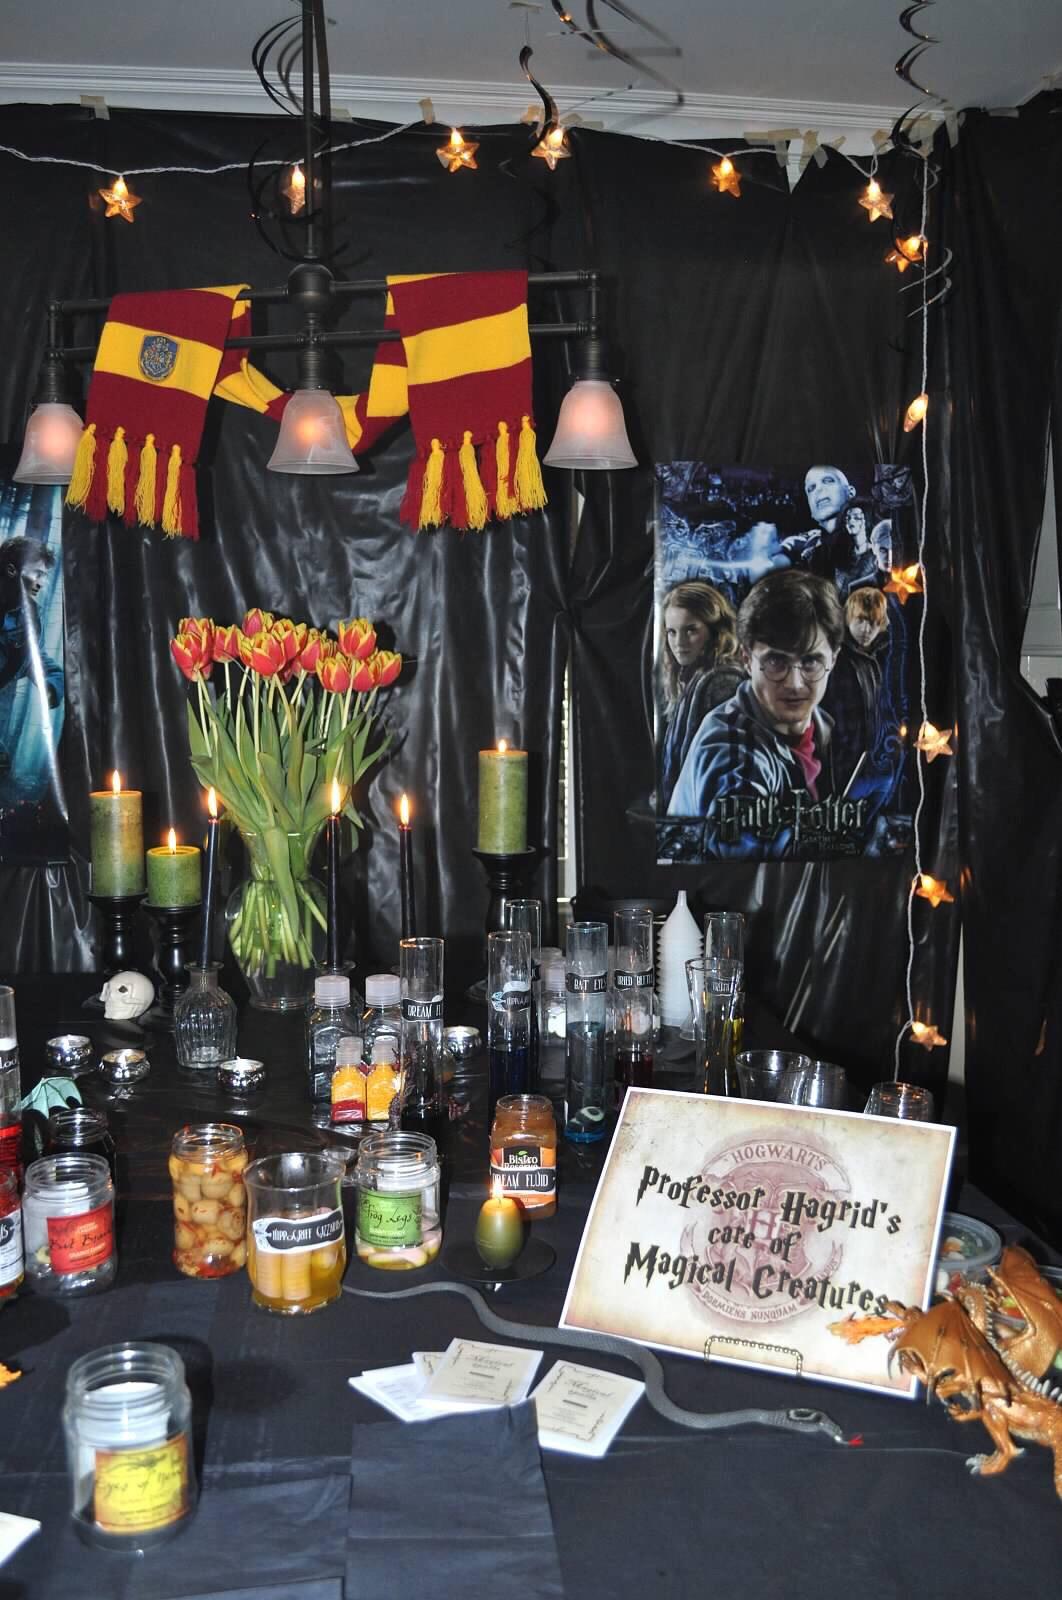 Harry Potter Party Ideas - Harry Potter Birthday Party Ideas and Inspiration, Harry Potter theme via Misty Nelson, frostedblog.com @frostedevents